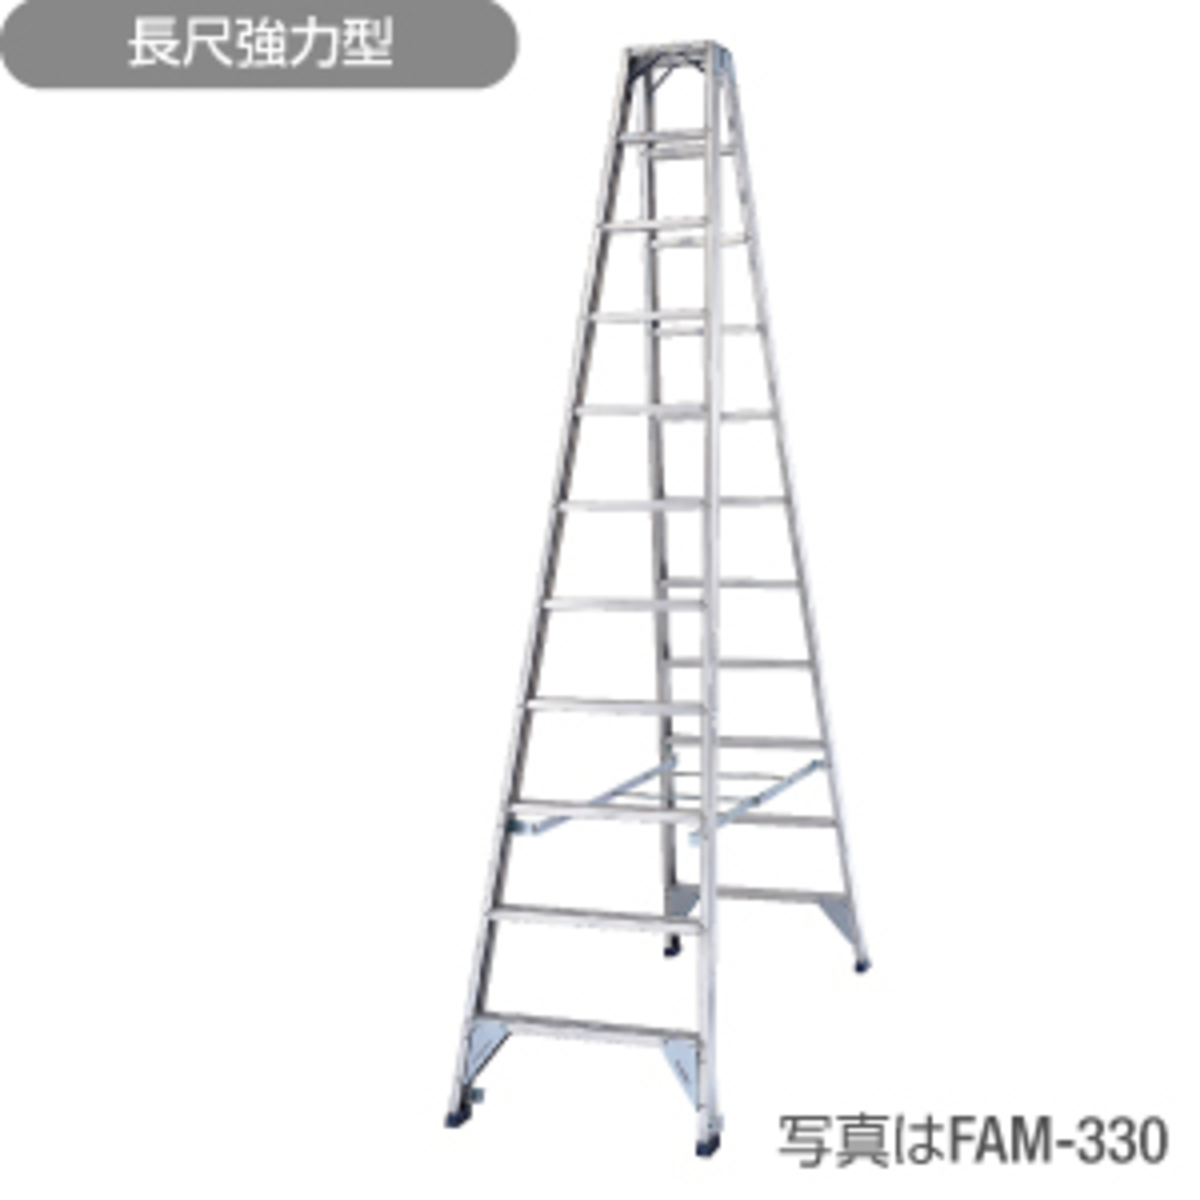 【FAM-390】長谷川工業 ハセガワ hasegawa 脚立 堅牢専用脚立 長尺脚立 374cm